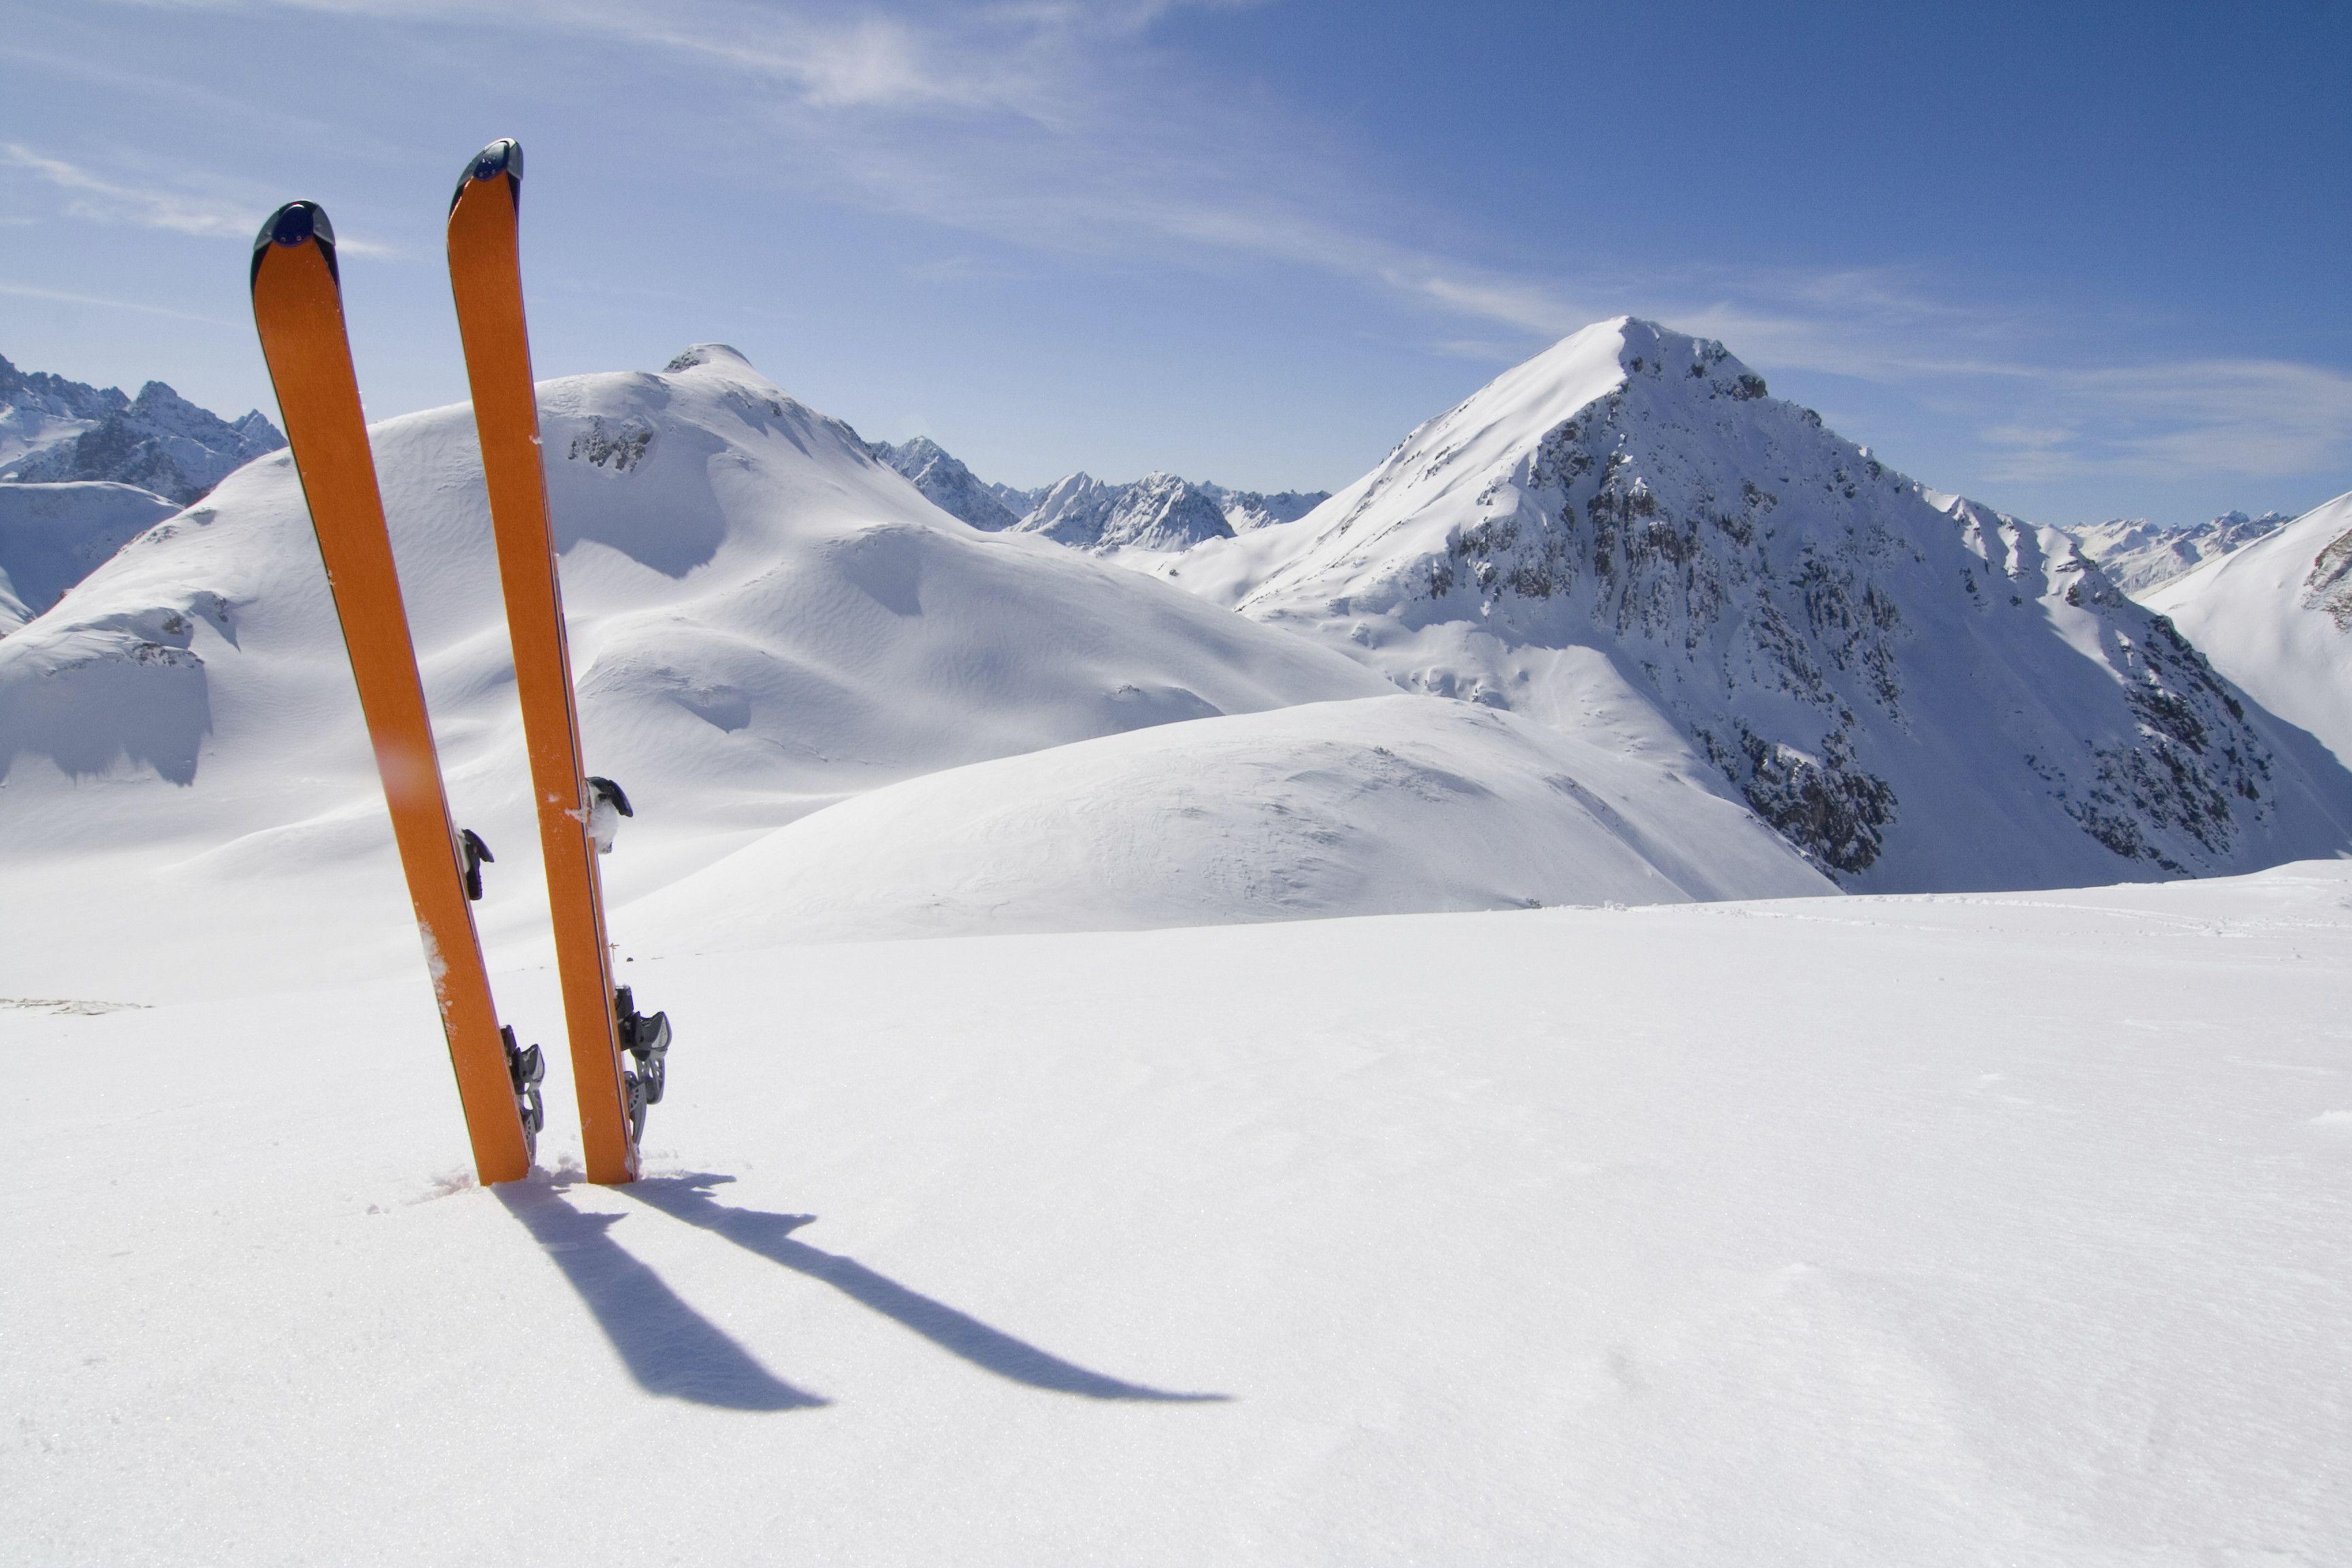 Orange Skis In The Snow